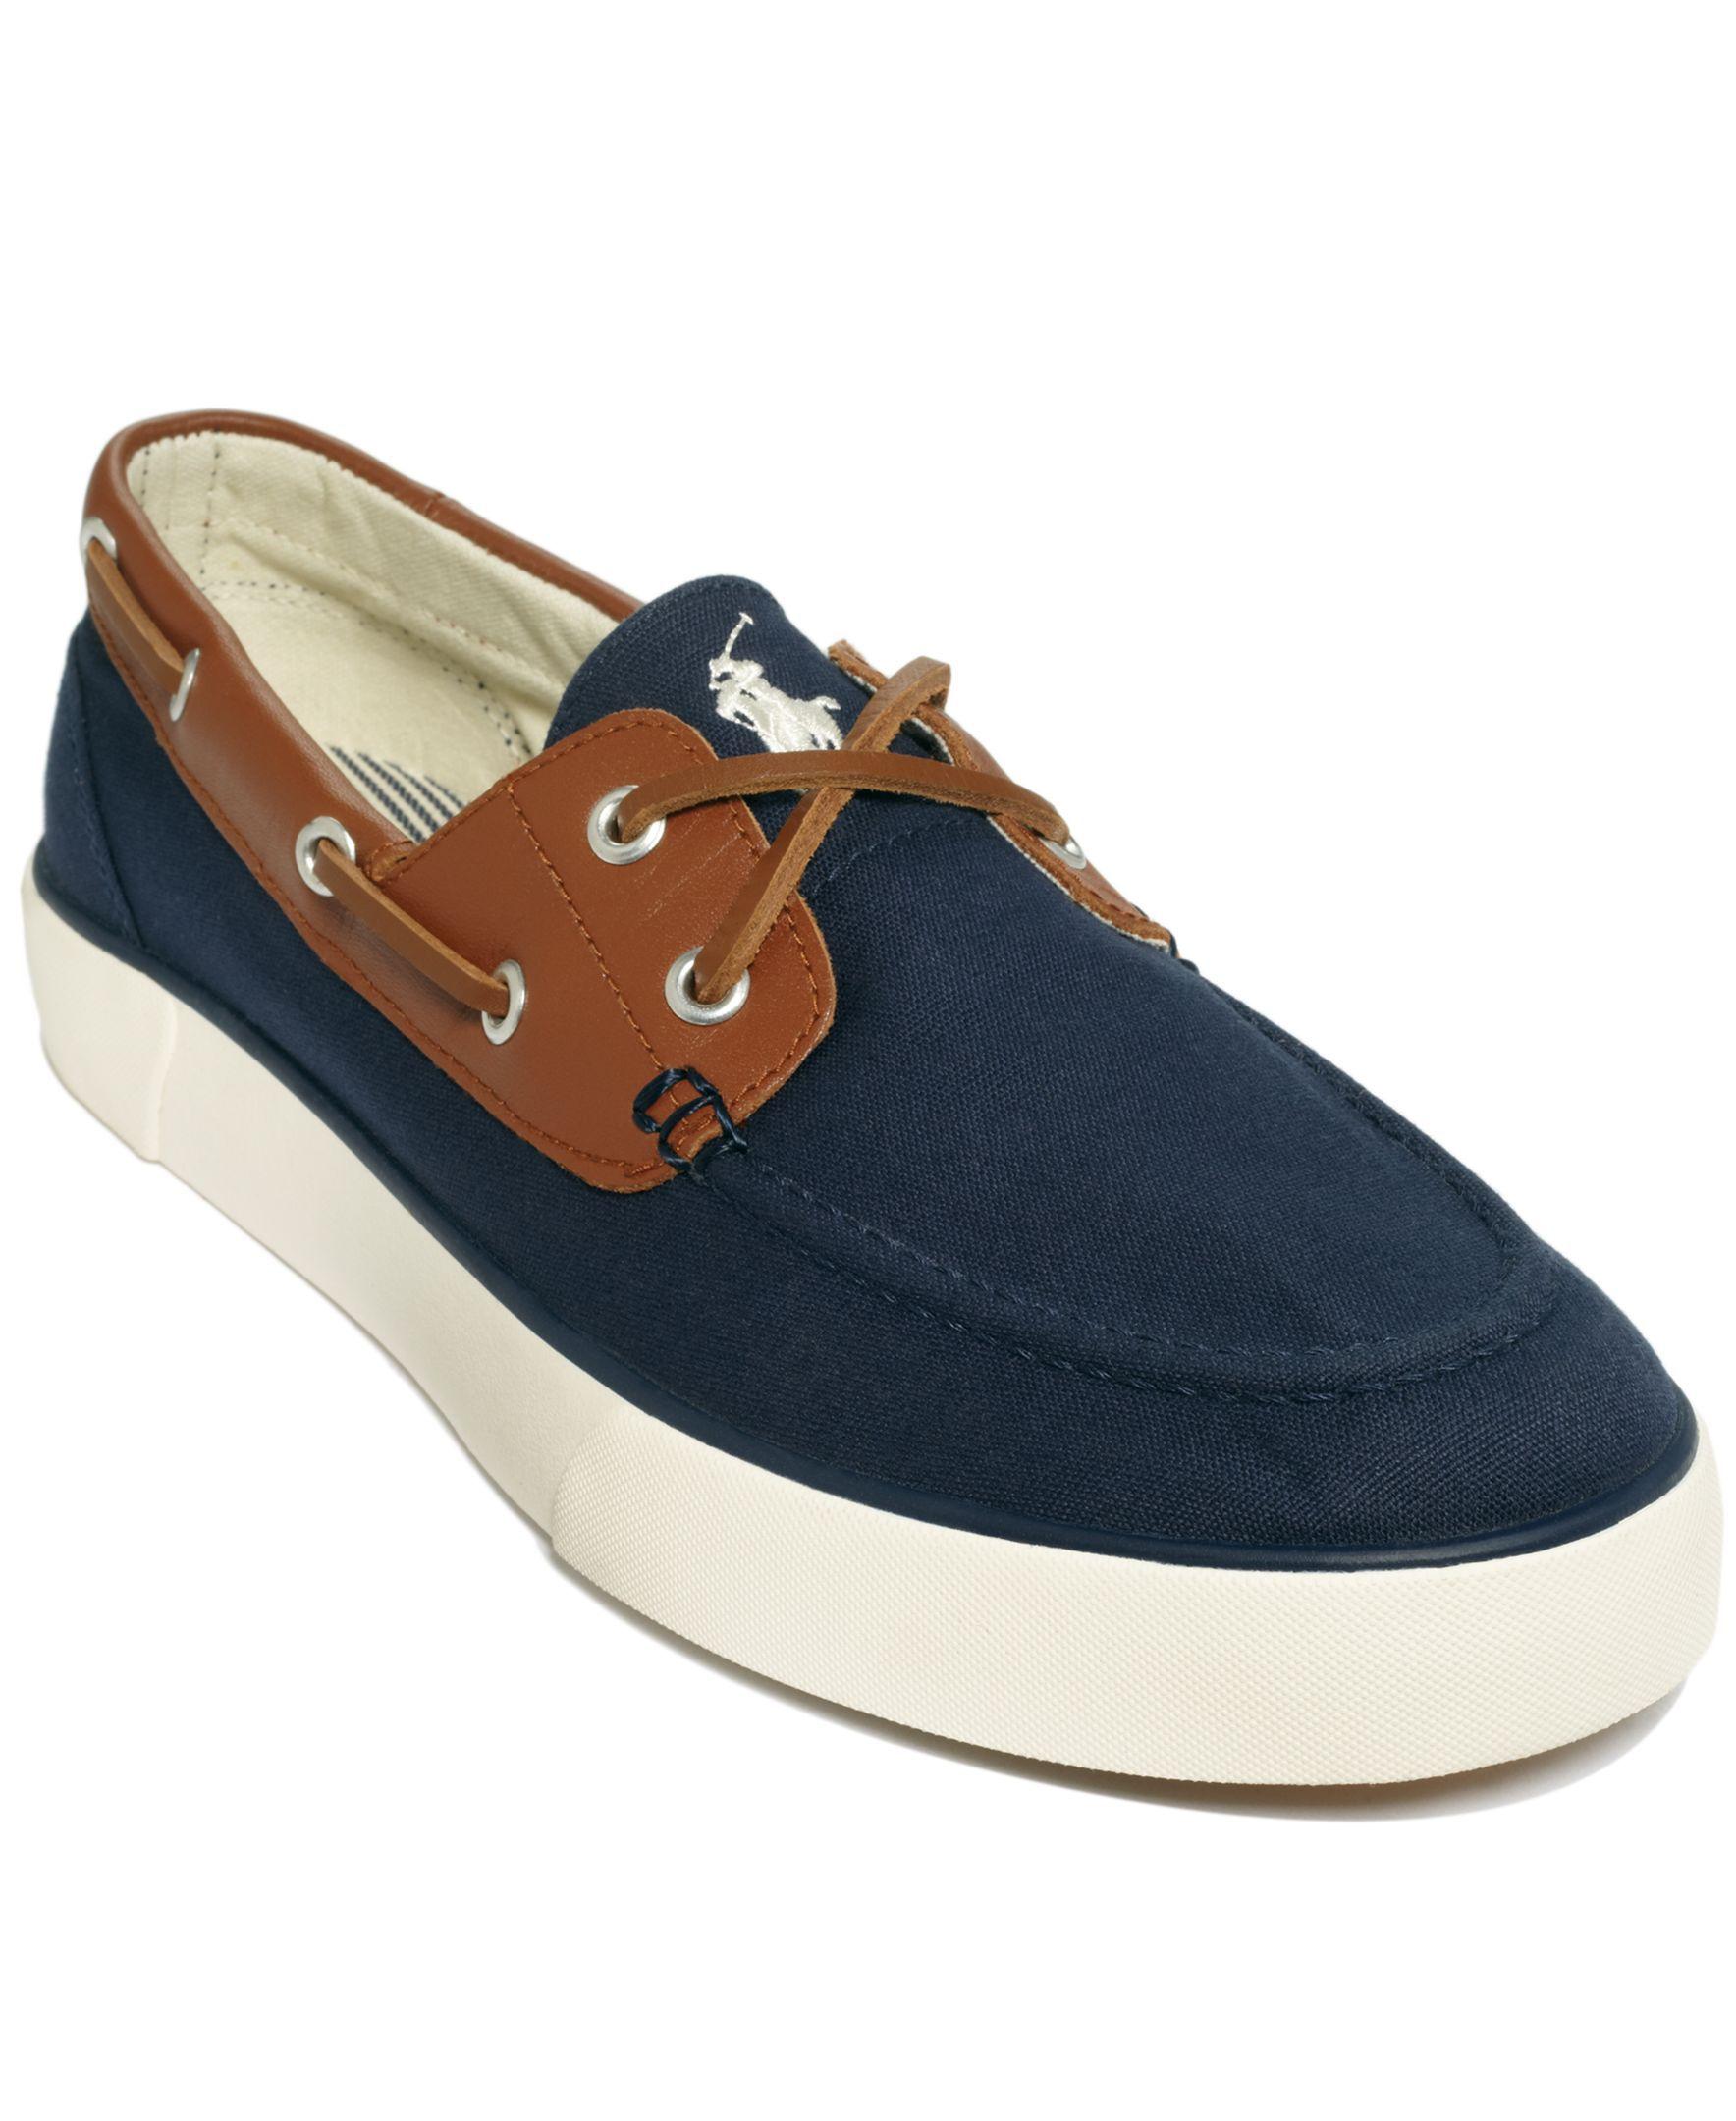 Polo Ralph Lauren Rylander Boat Shoes